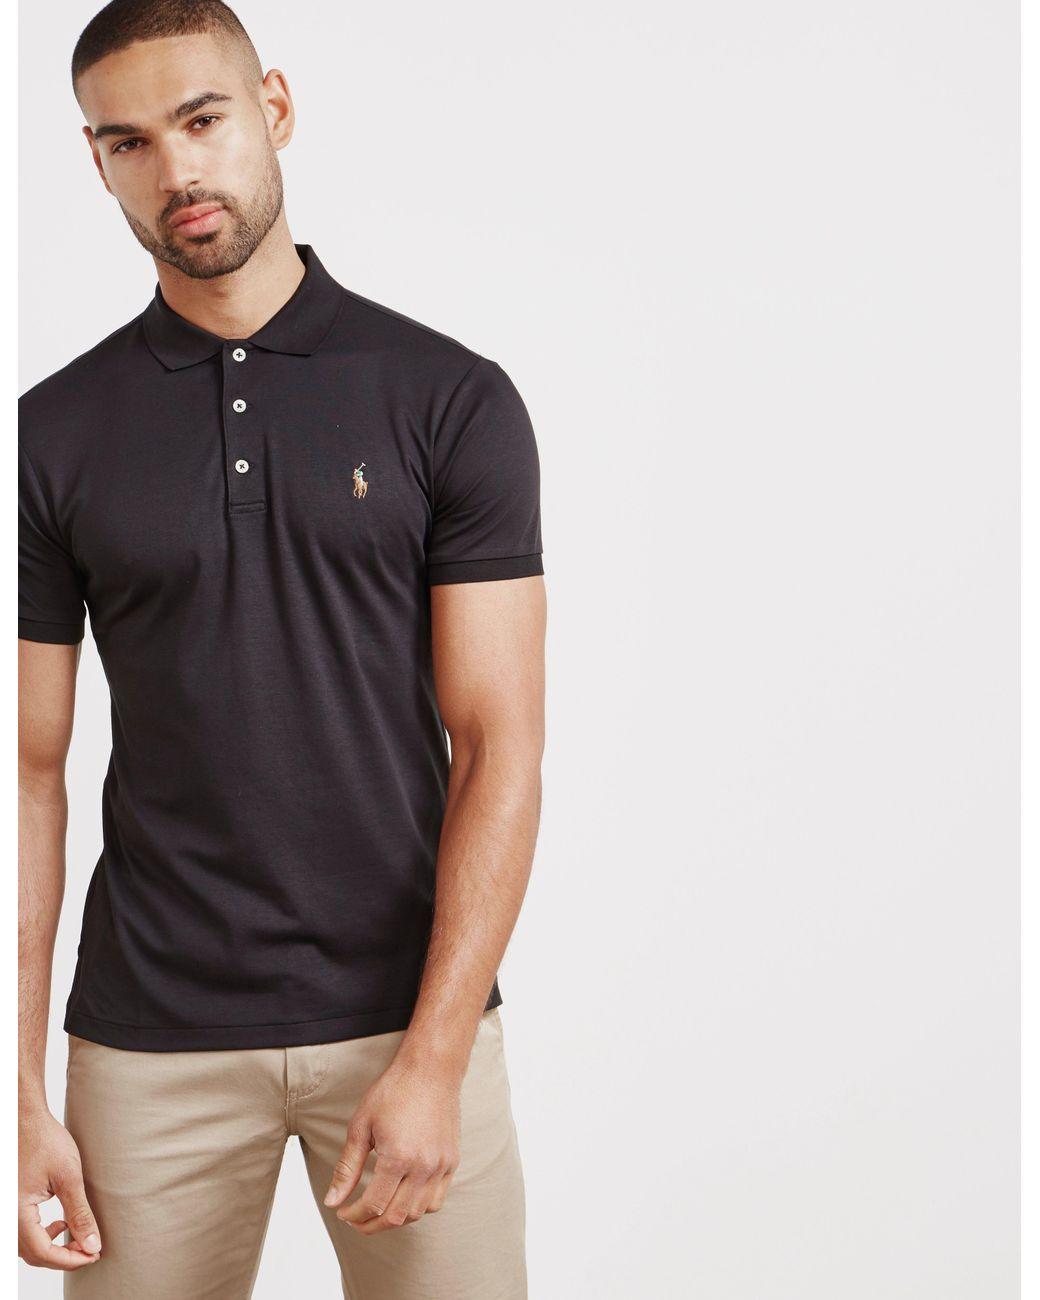 163e944c Polo Ralph Lauren Pima Short Sleeve Polo Shirt Black in Black for ...